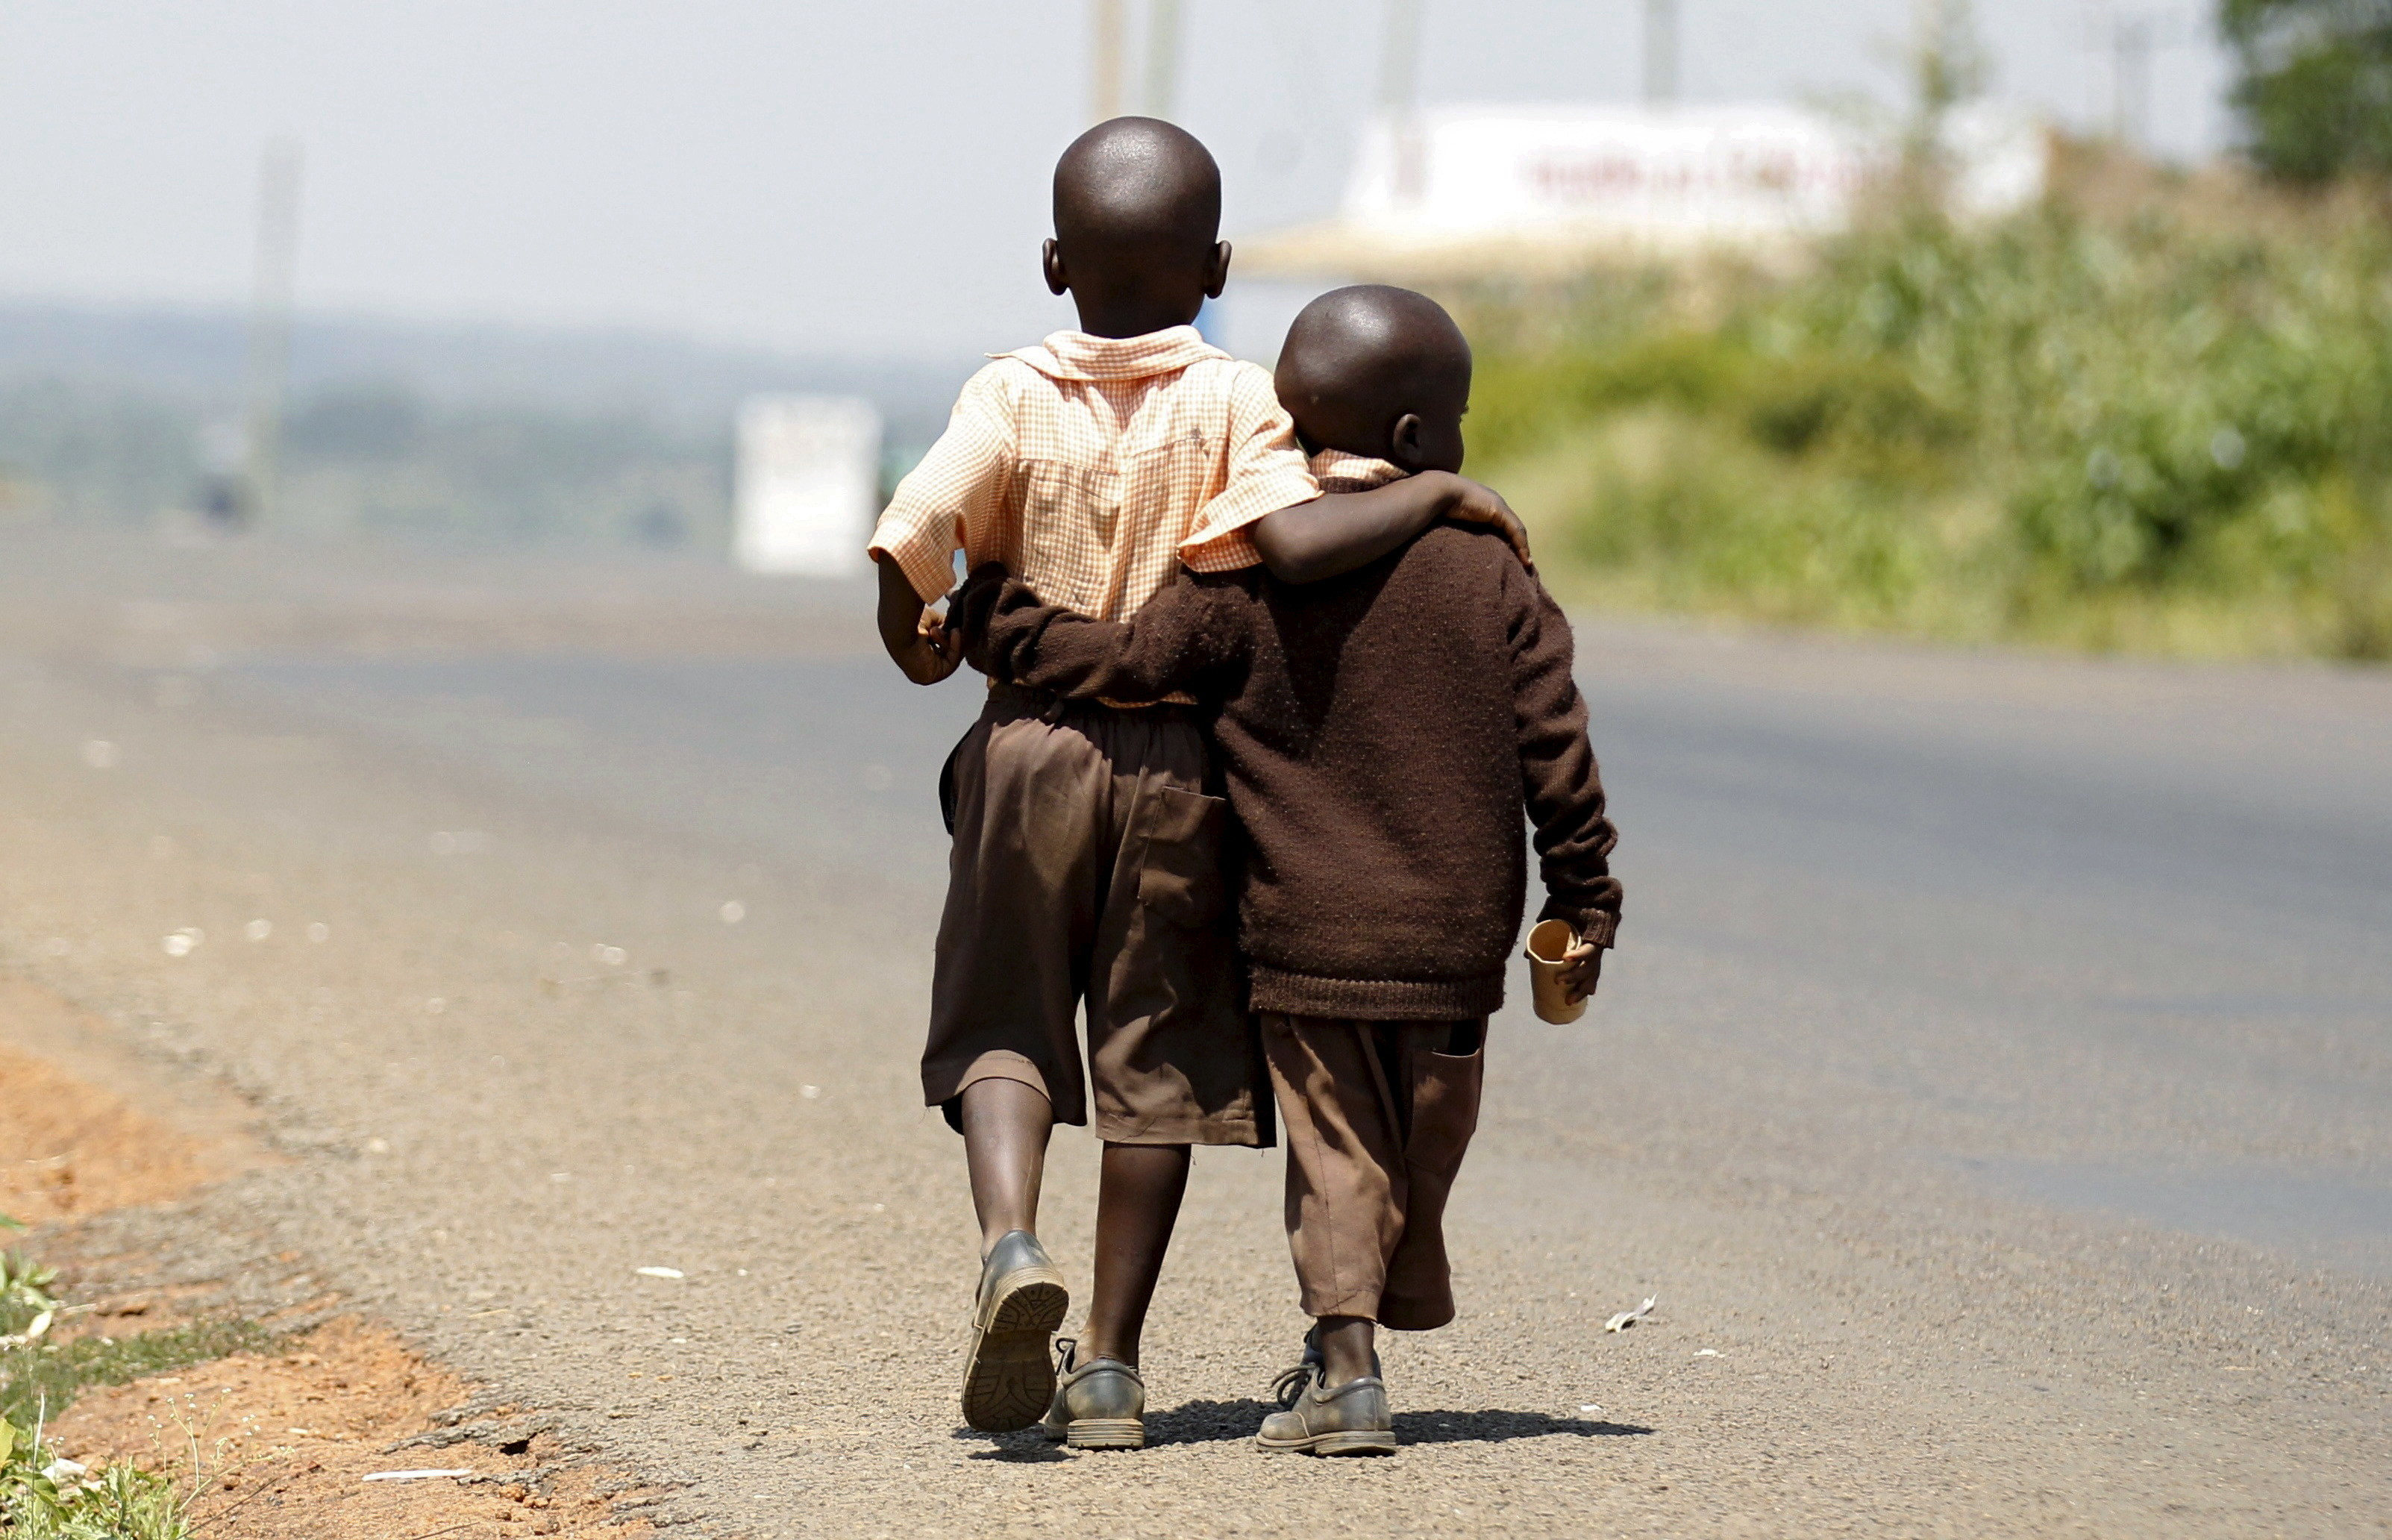 image of children walking home from school in the village of Kogelo, west of Kenya's capital Nairobi